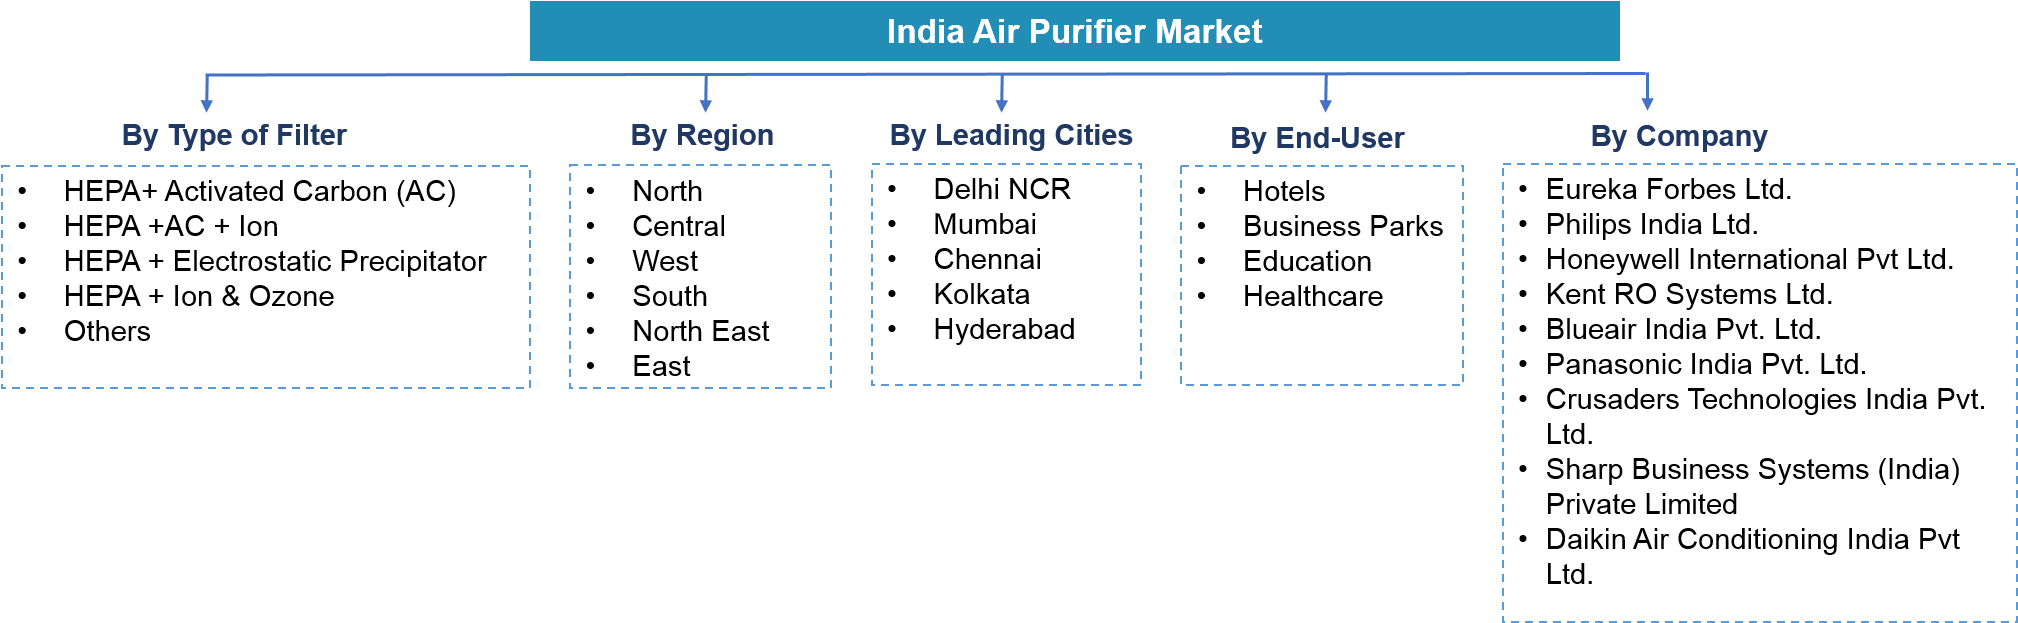 India Air Purifier Market Segmentation